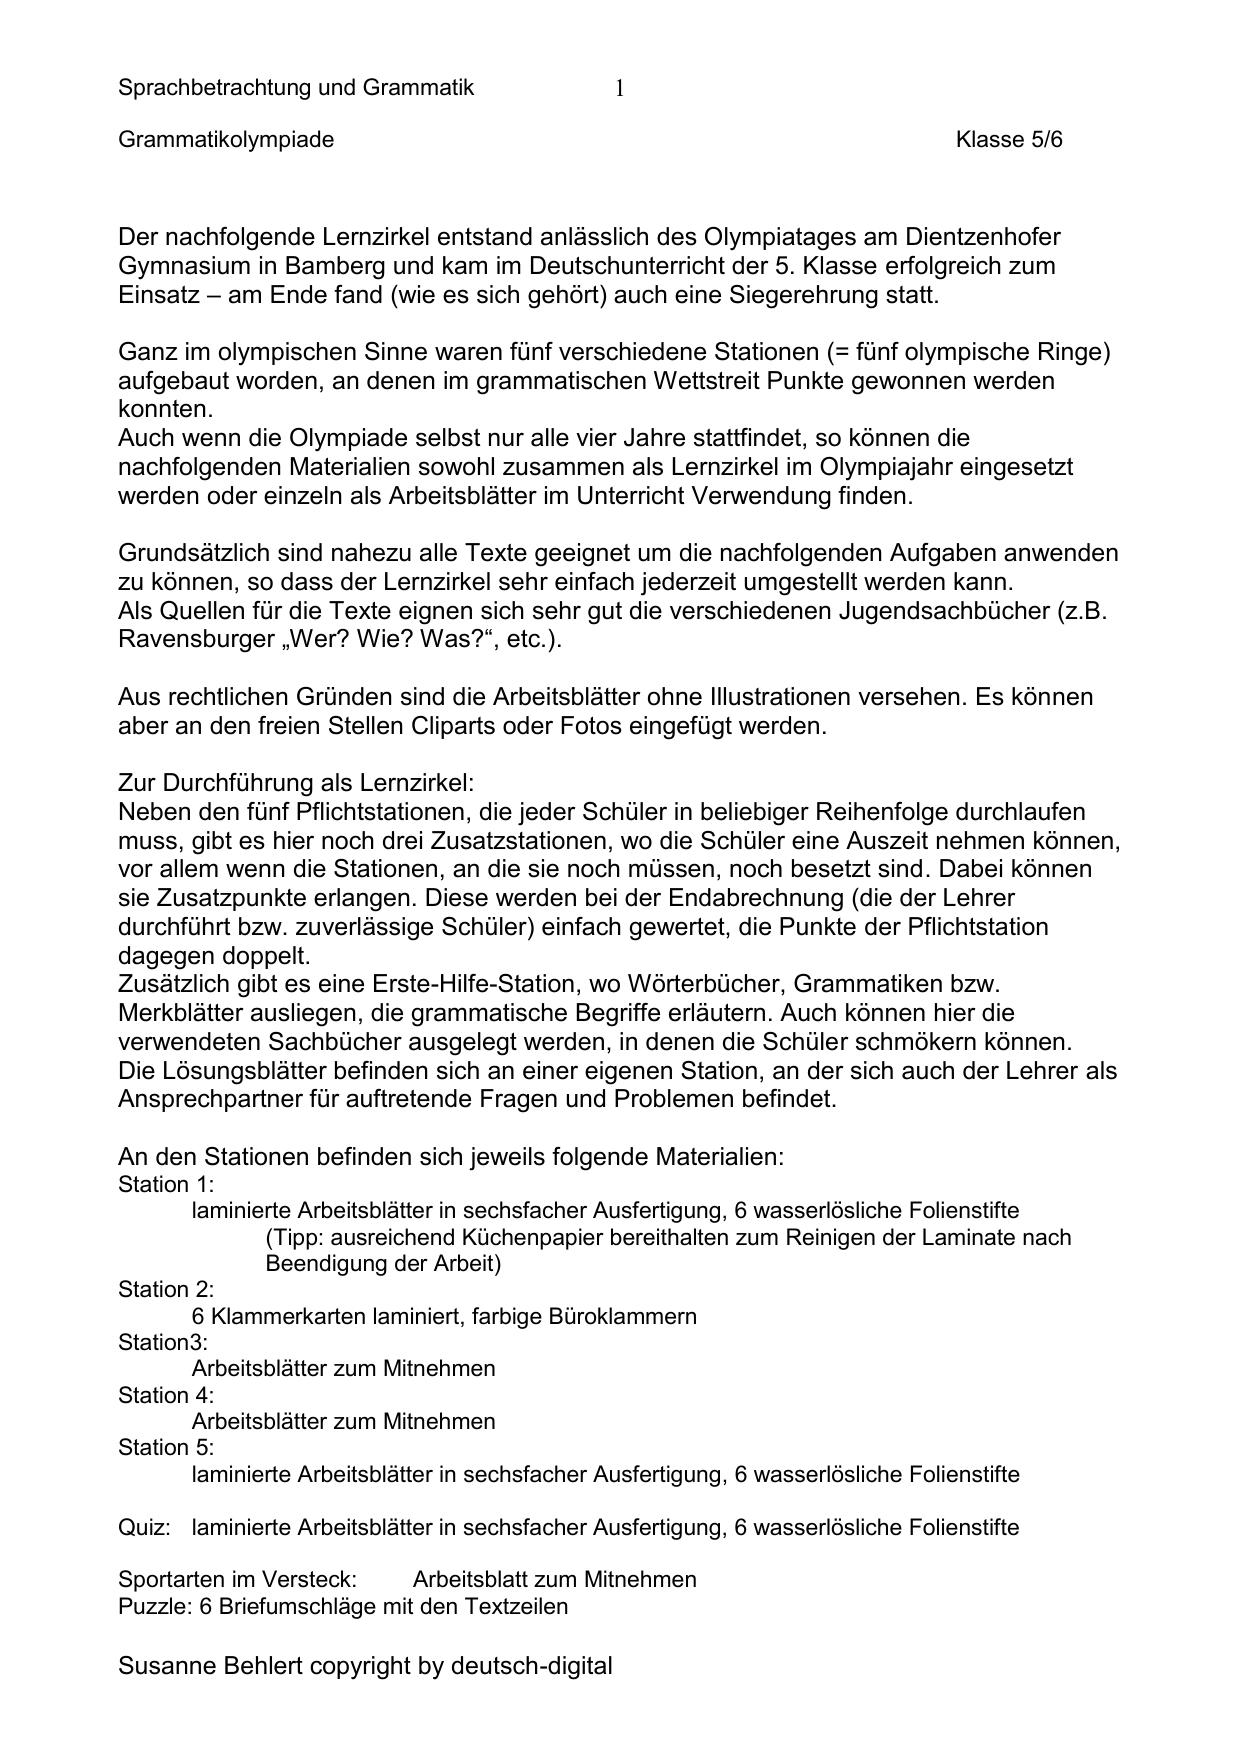 Großzügig Dot Arbeitsblatt Für 3 Jahre Punkt Ideen - Super Lehrer ...